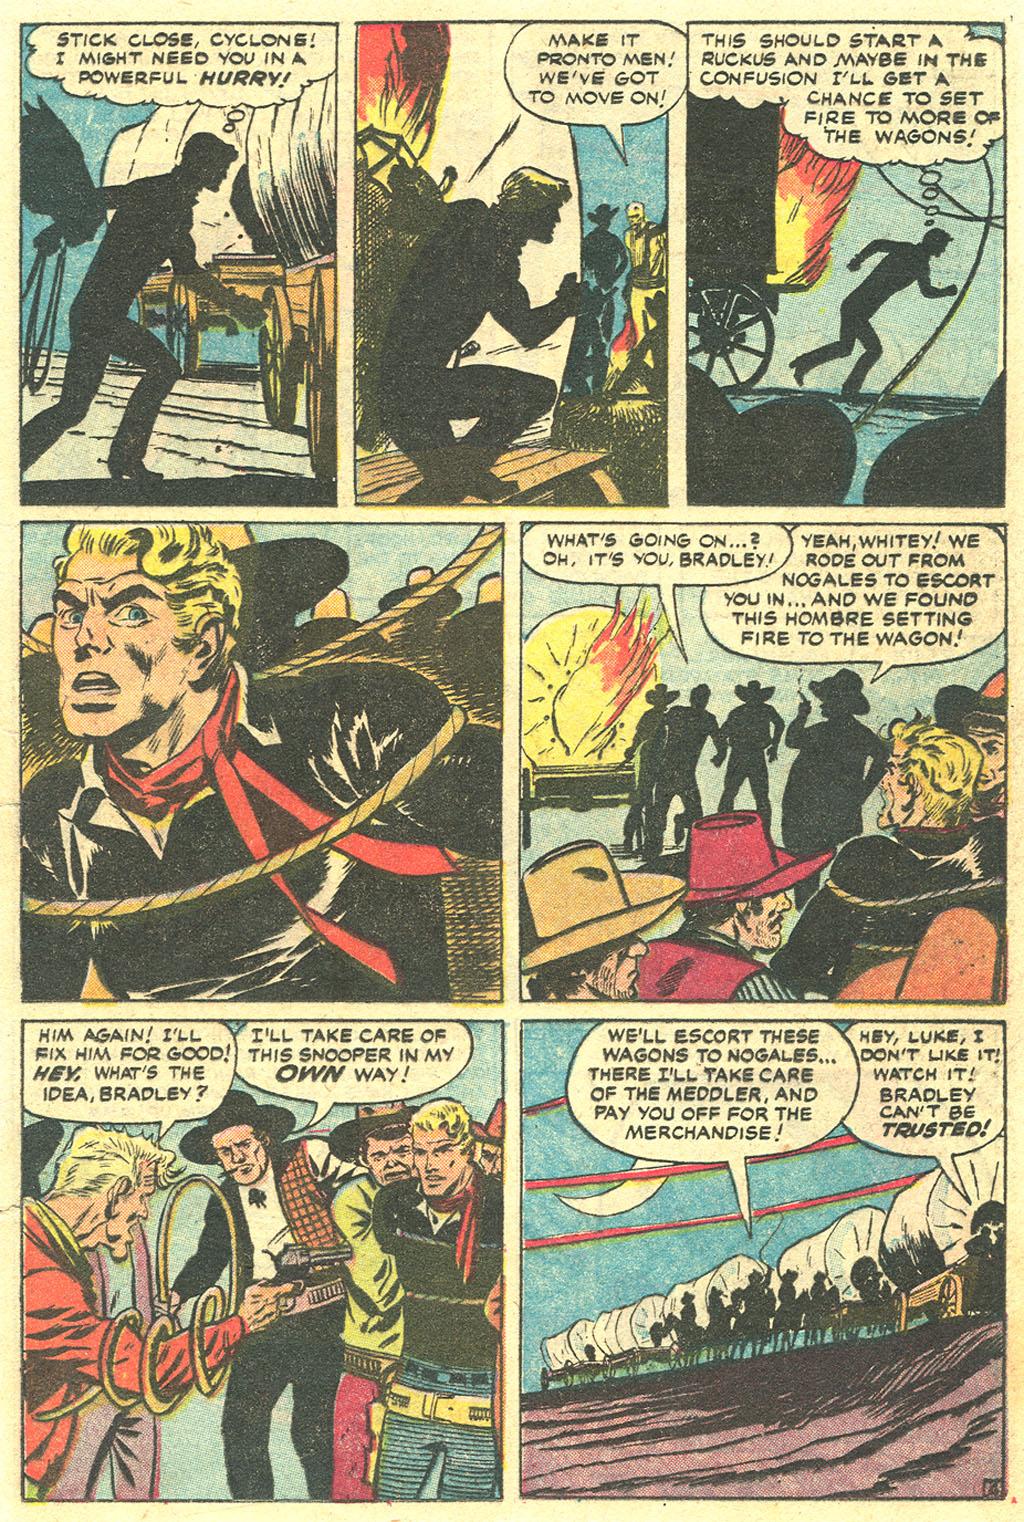 Read online Two-Gun Kid comic -  Issue #29 - 13